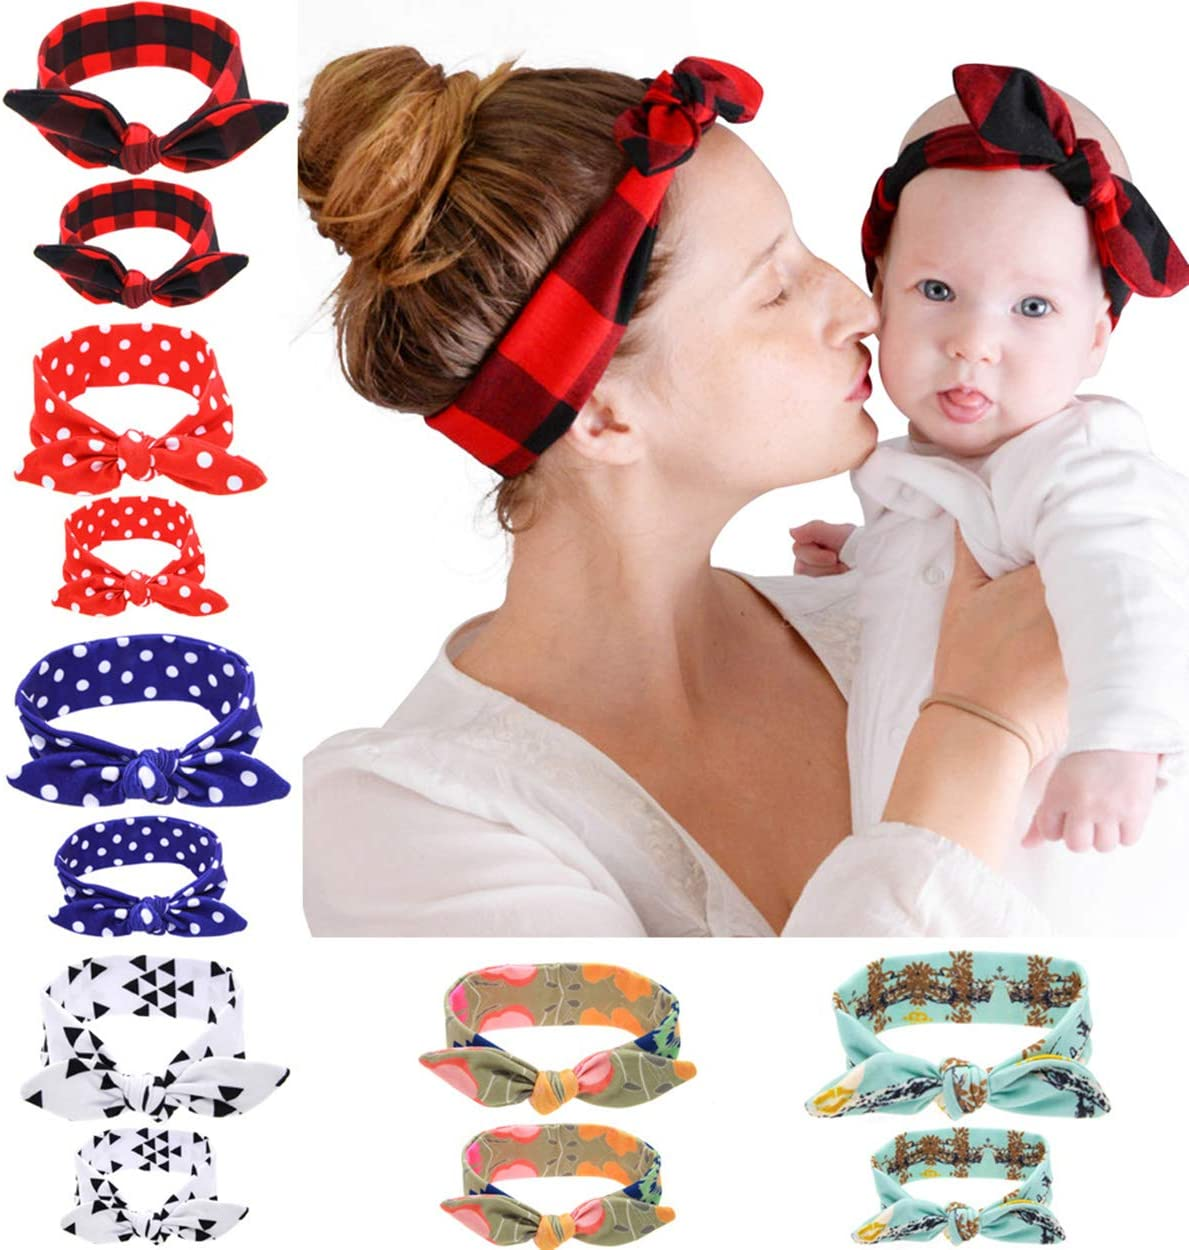 ba knife Headbands Multicolor Pattern Headband, Bow Head Wrap Hair Band for Women